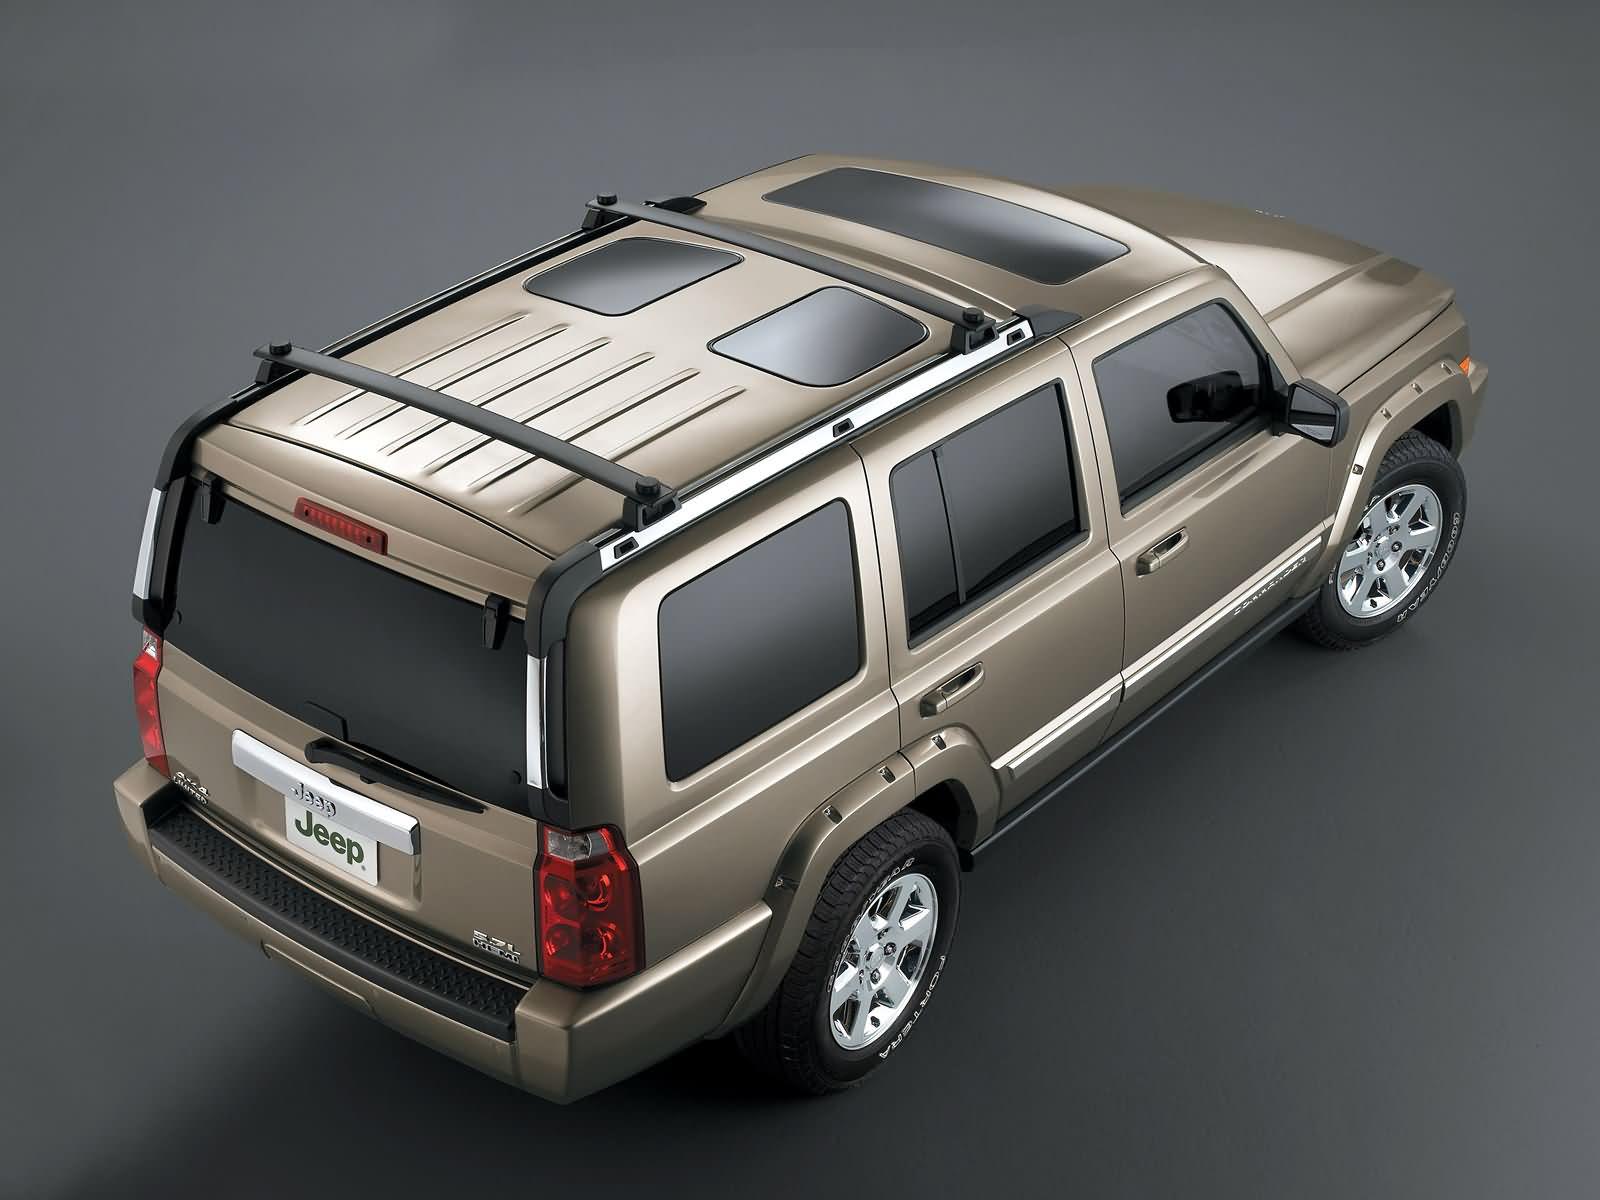 Wallpaper : Jeep, 2012, netcarshow, netcar, car images, car photo ...